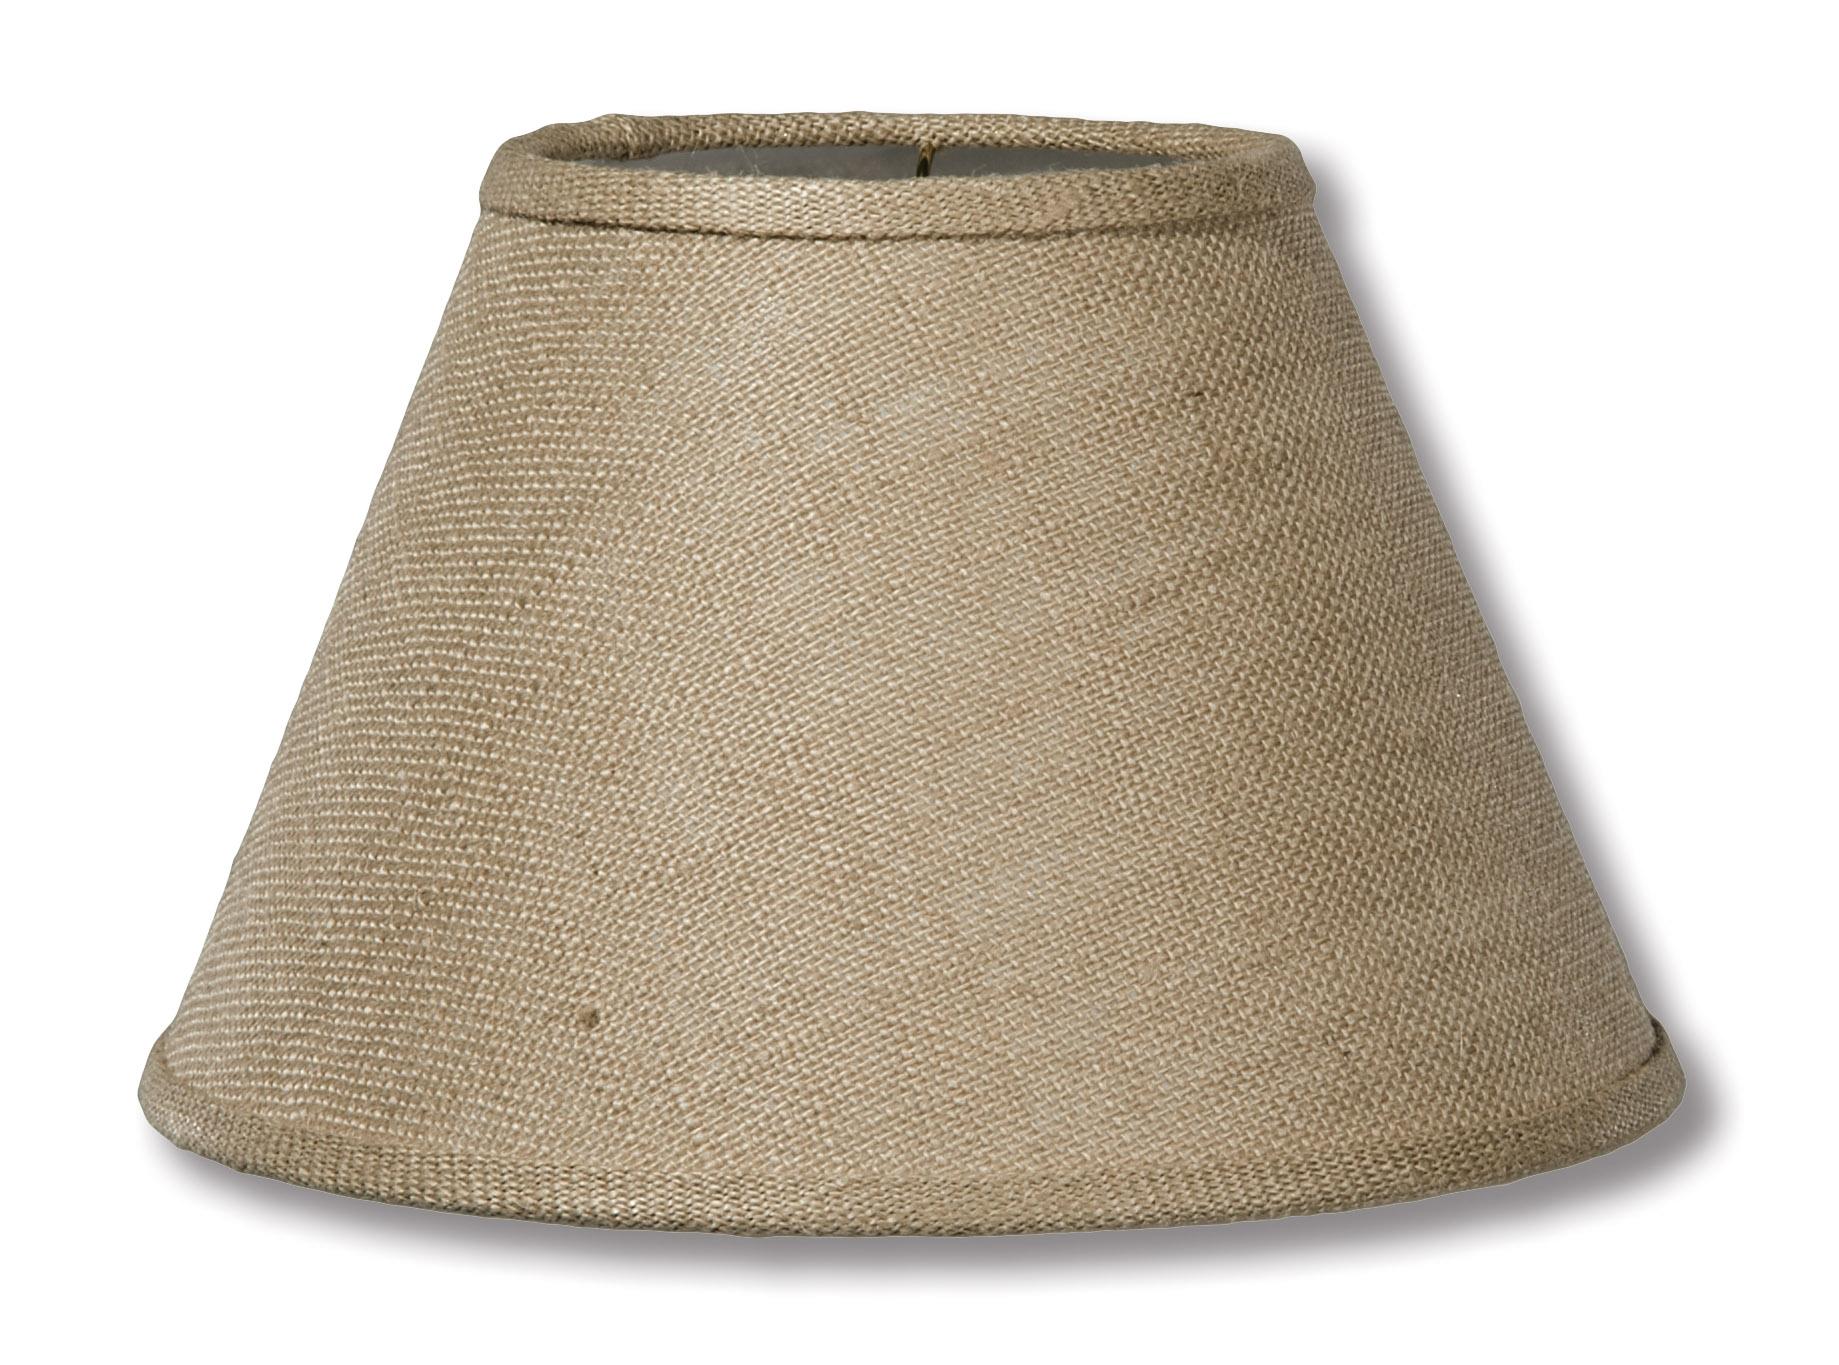 Burlap Empire Hardback Shade 06986b B Amp P Lamp Supply